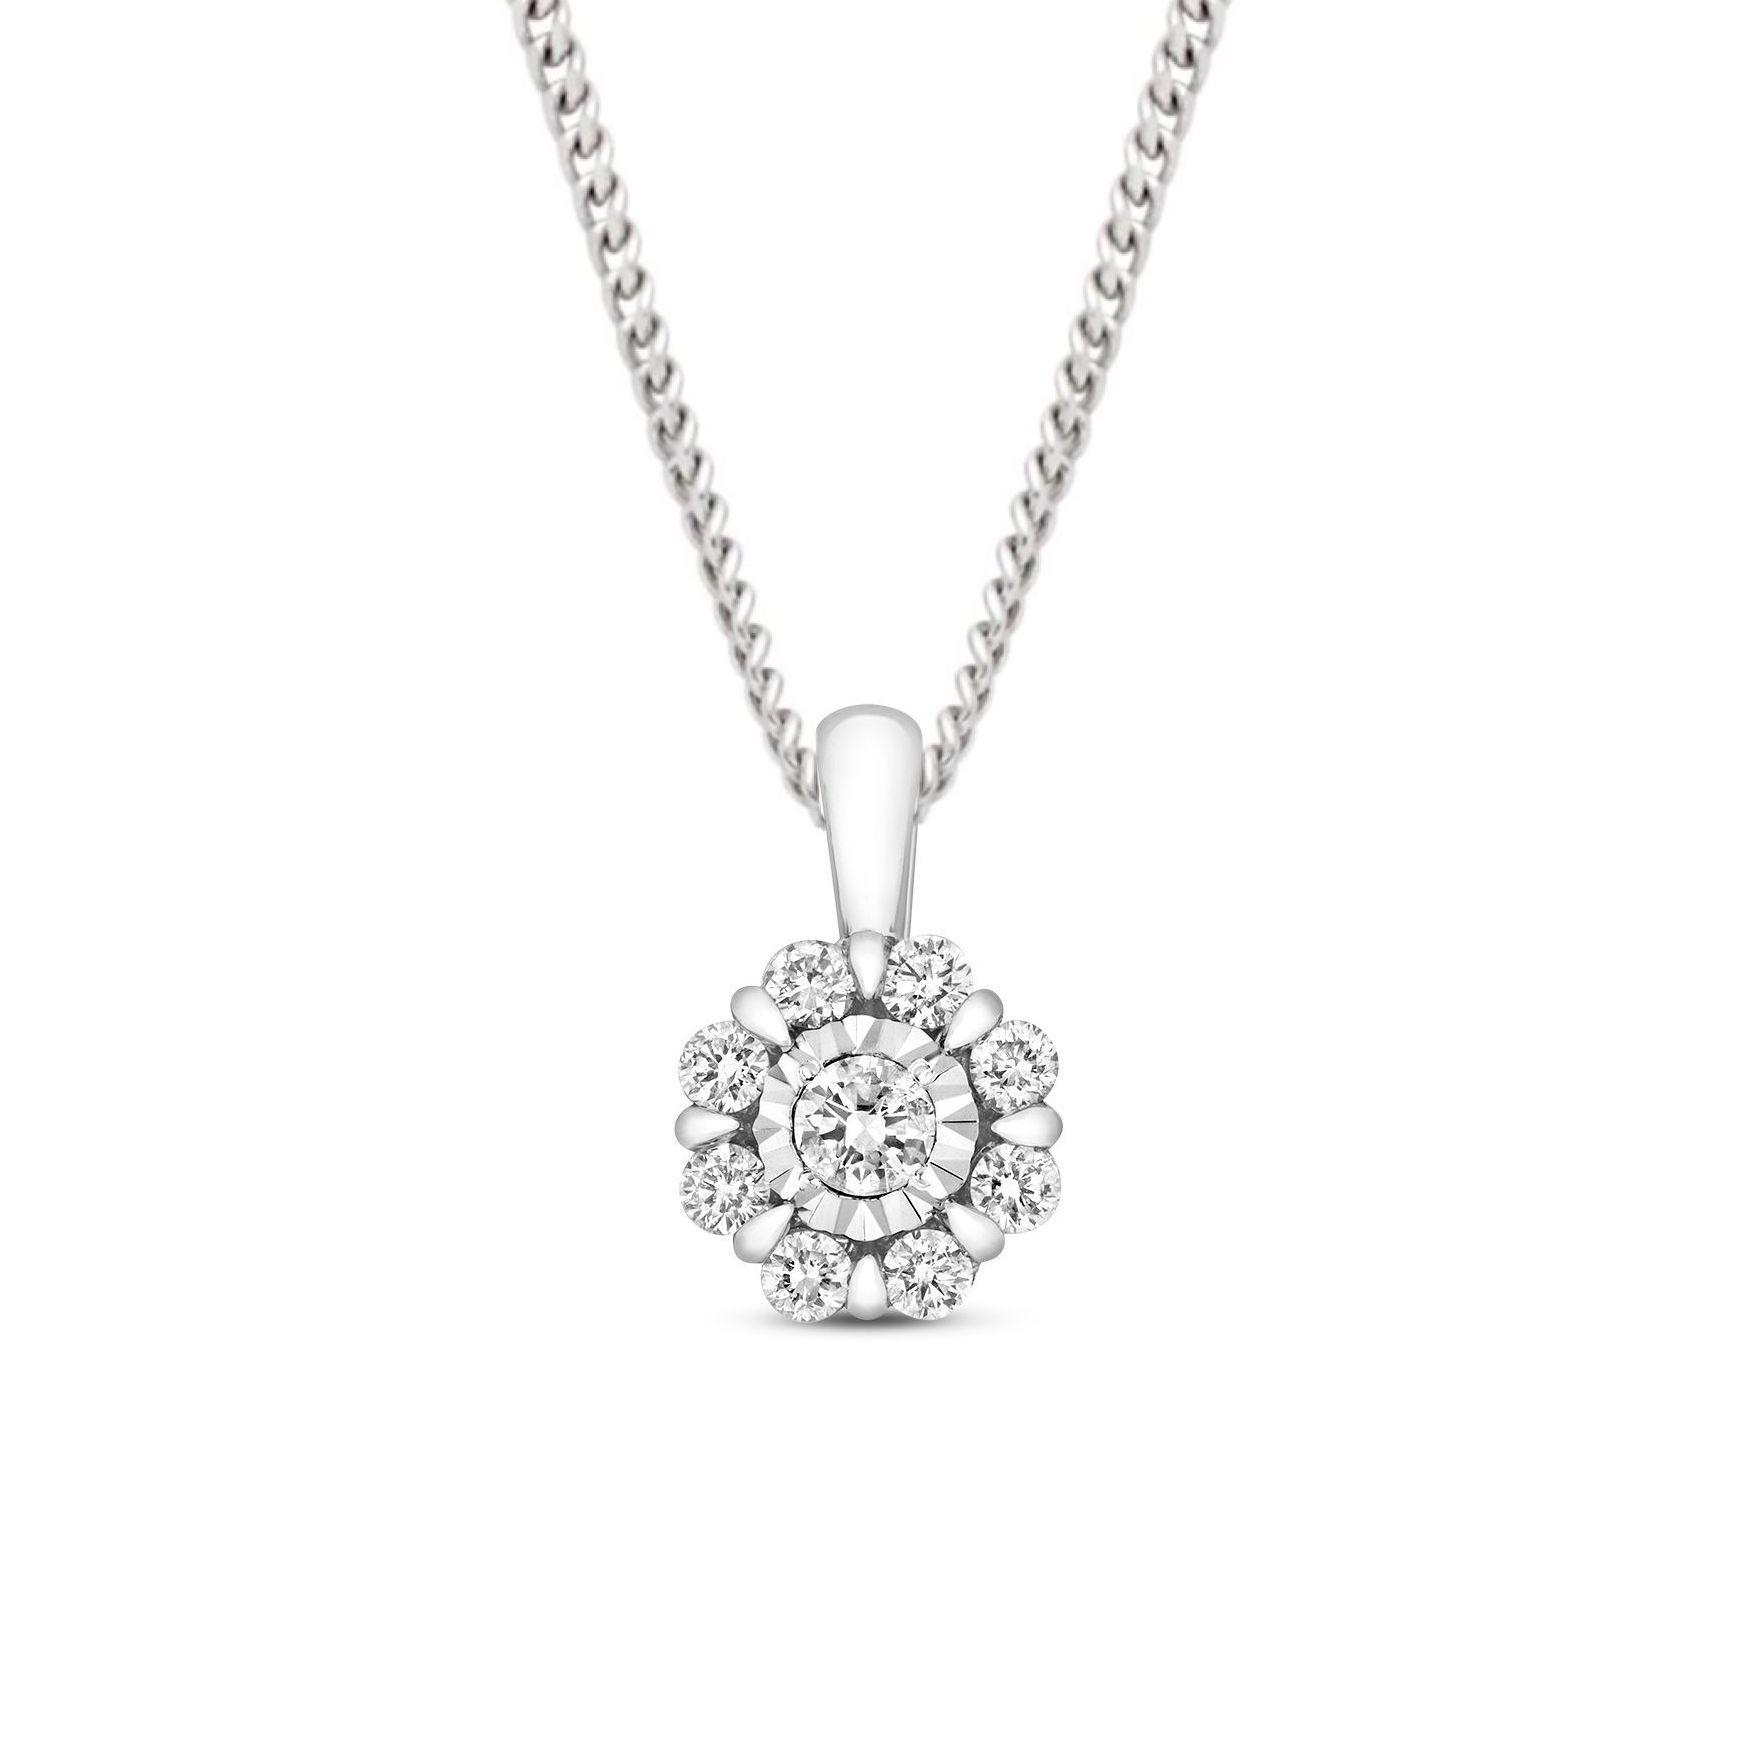 0.33 Carat Cluster Solitaire Diamond Pendant Necklace for Women